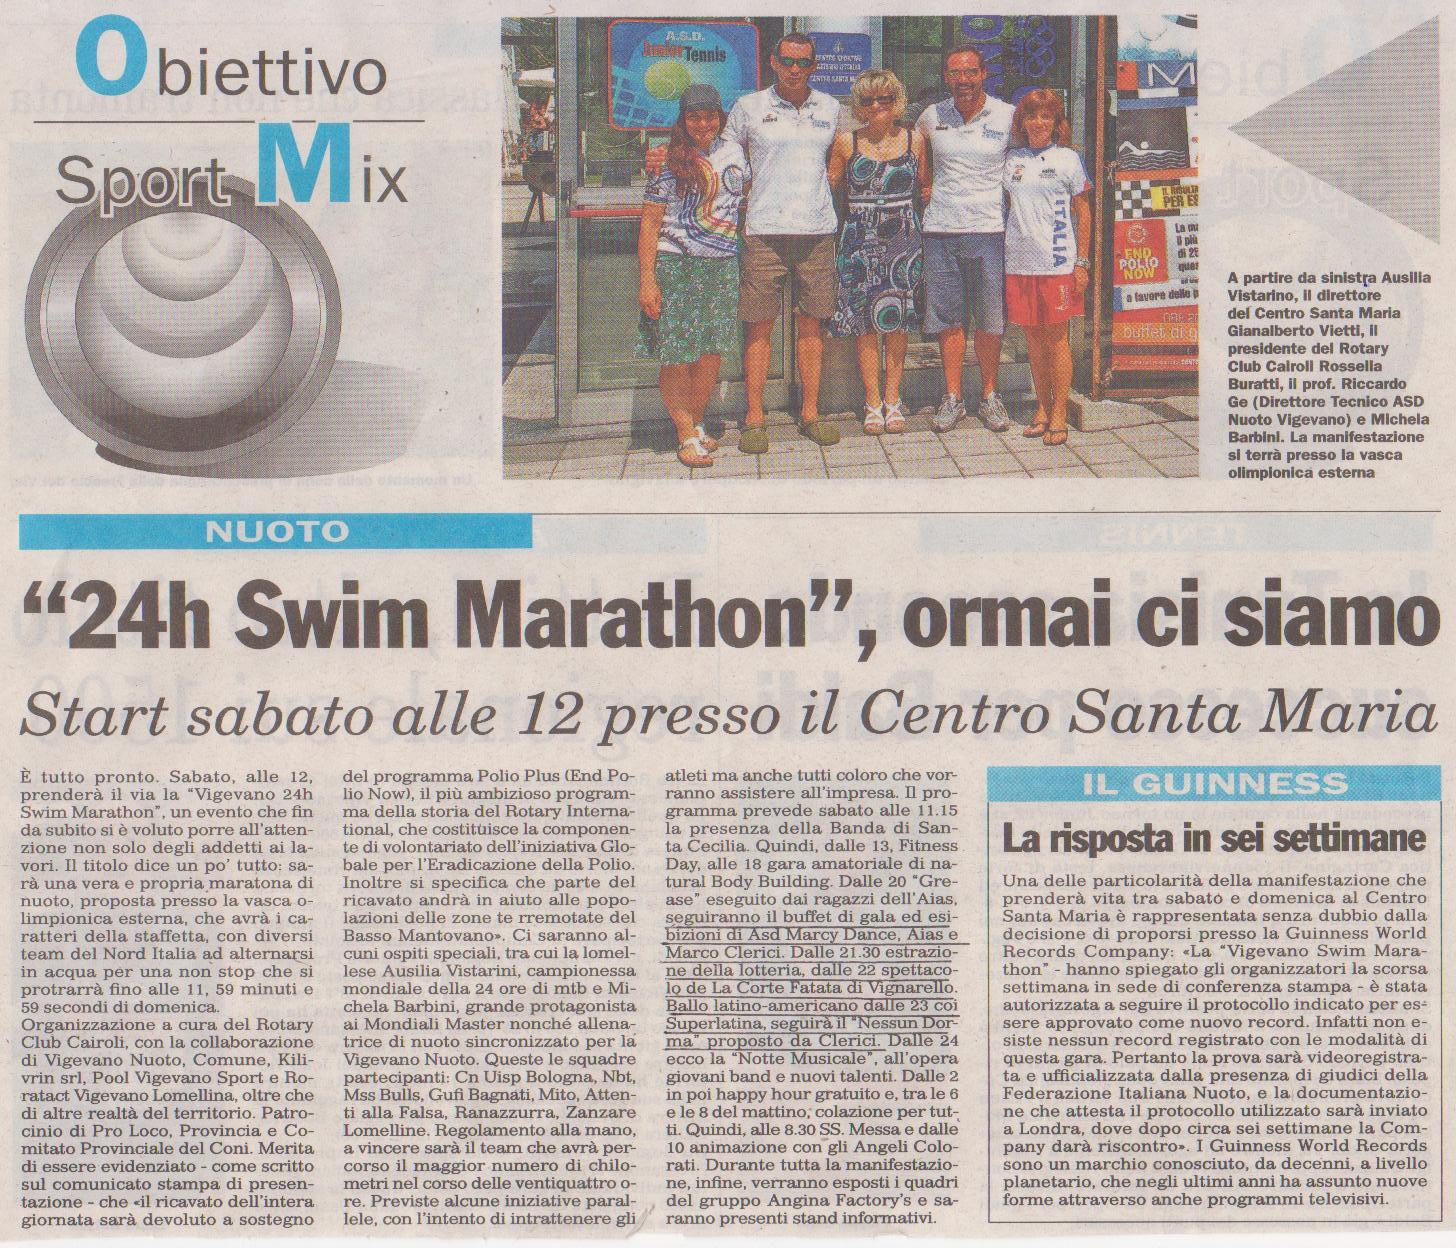 Swim Marathon